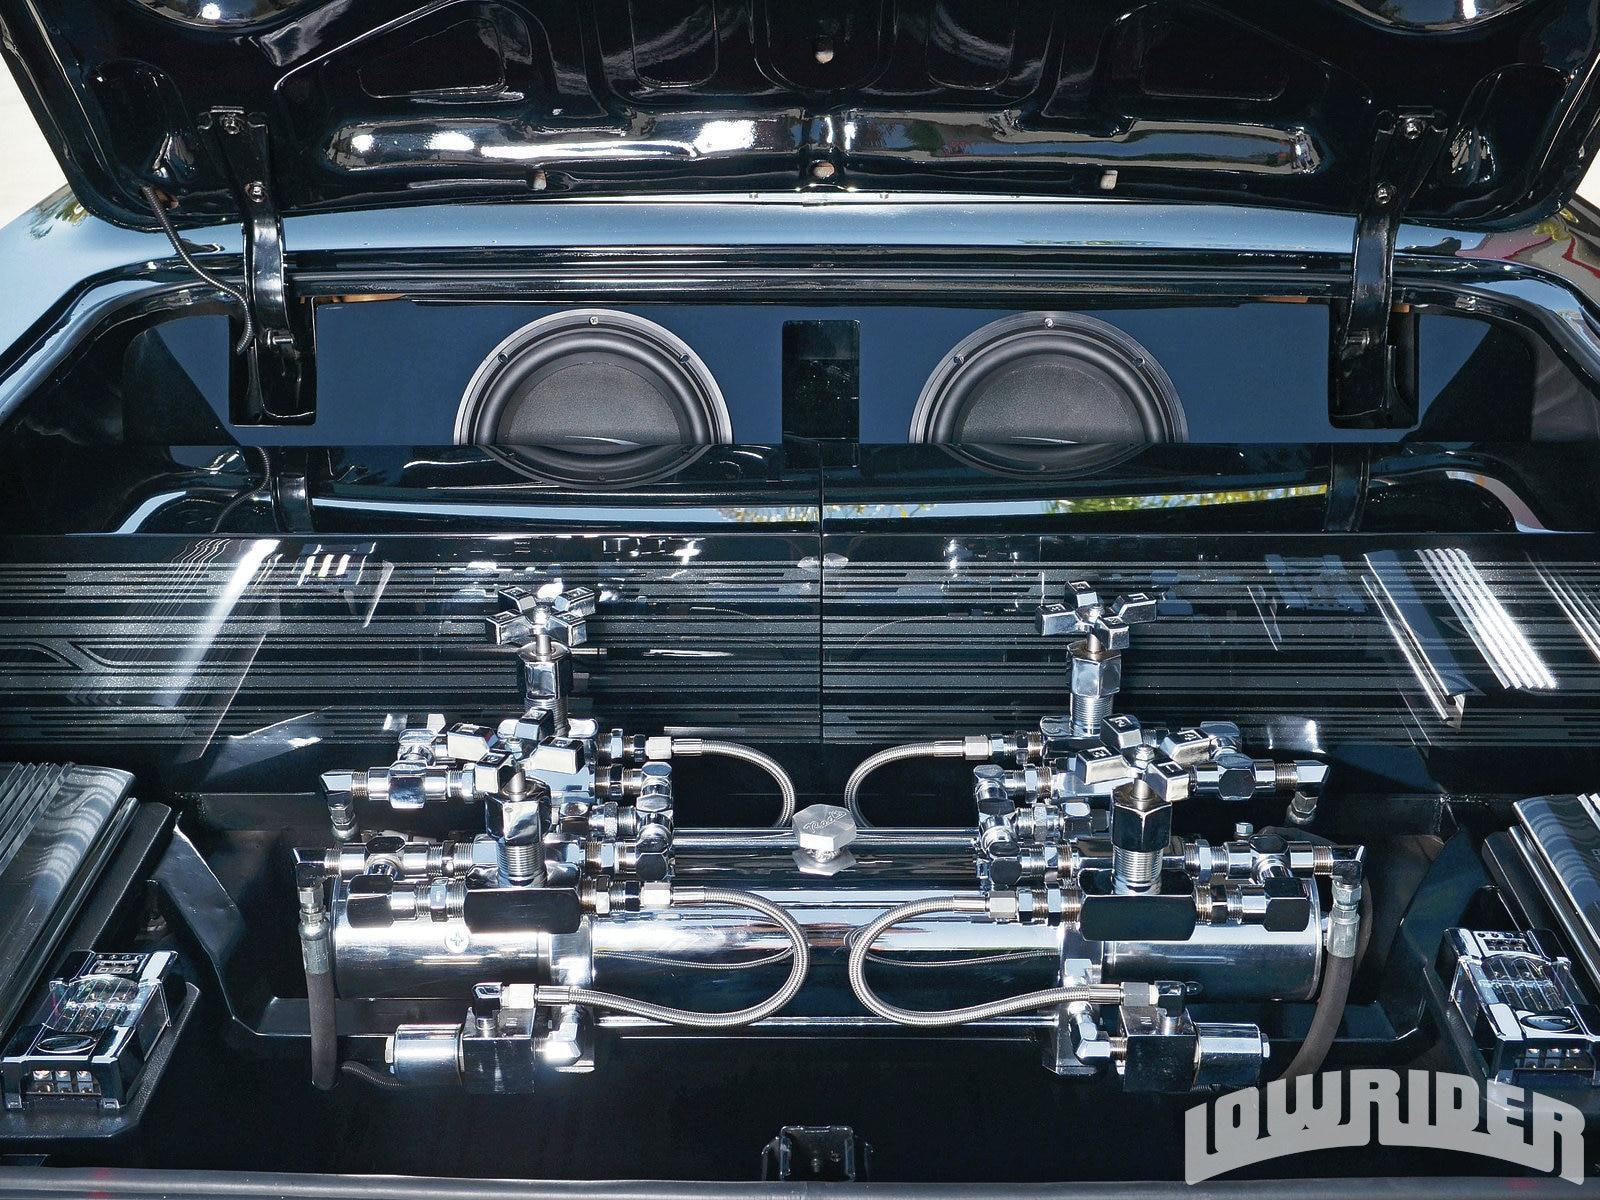 1964 Chevrolet Impala Ss Rag Top Lowrider Magazine